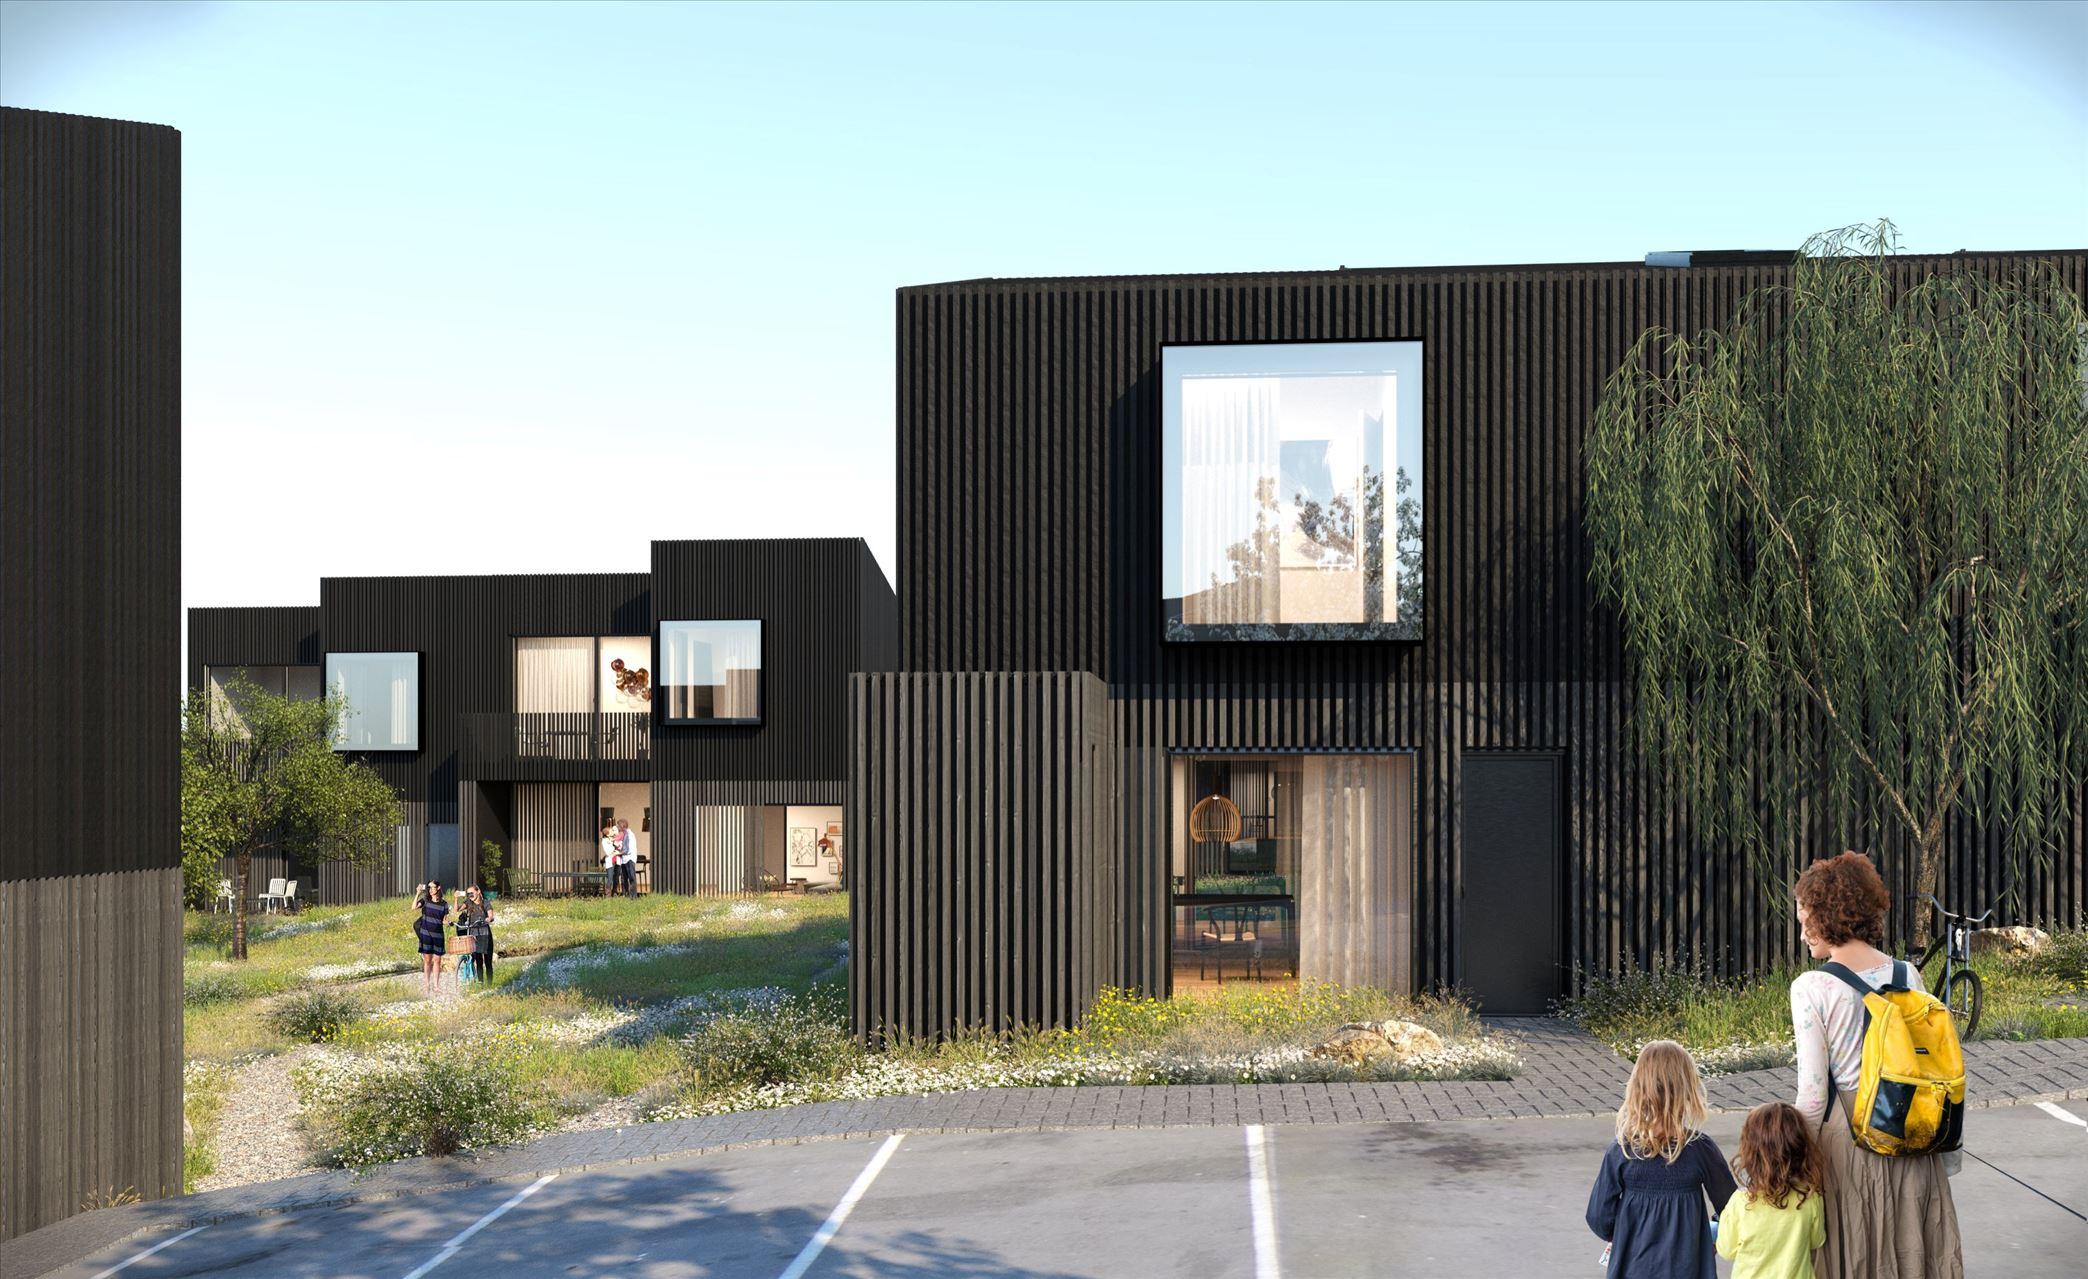 Rækkehus til Salg - Toppen 67, trekroner, 4000 Roskilde